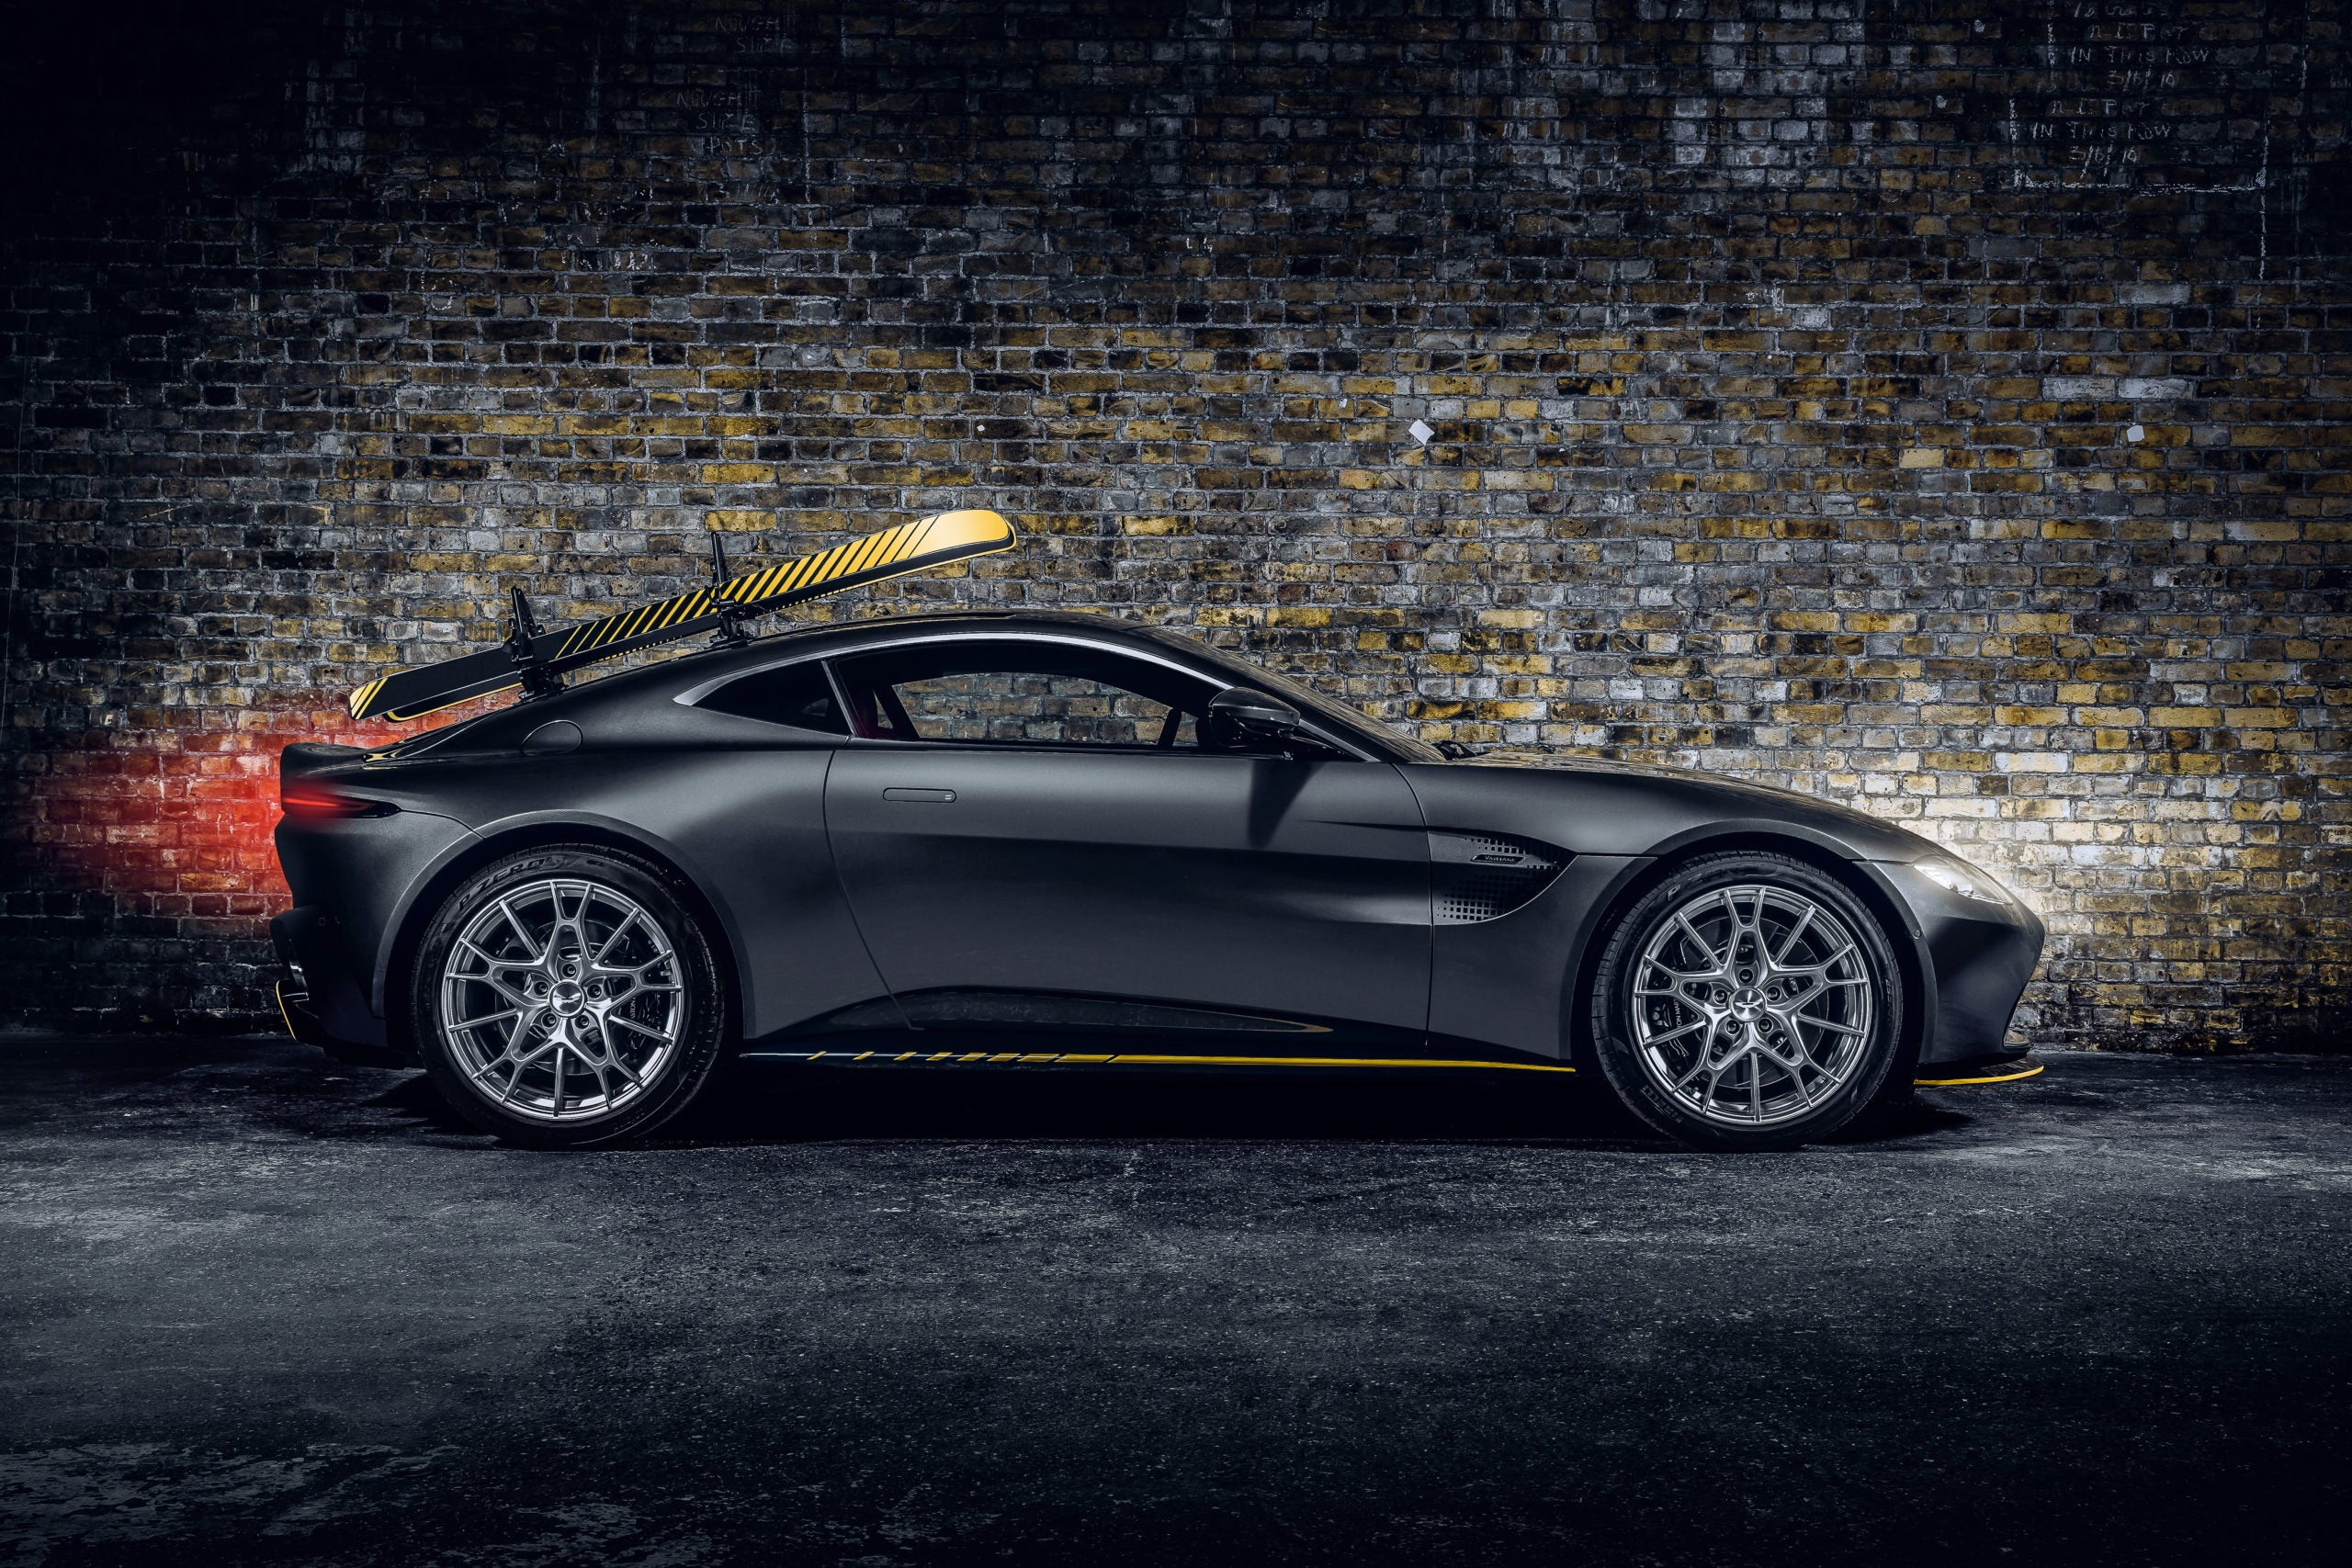 Aston Martin Vantage 007 Edition 02 James Bond 007